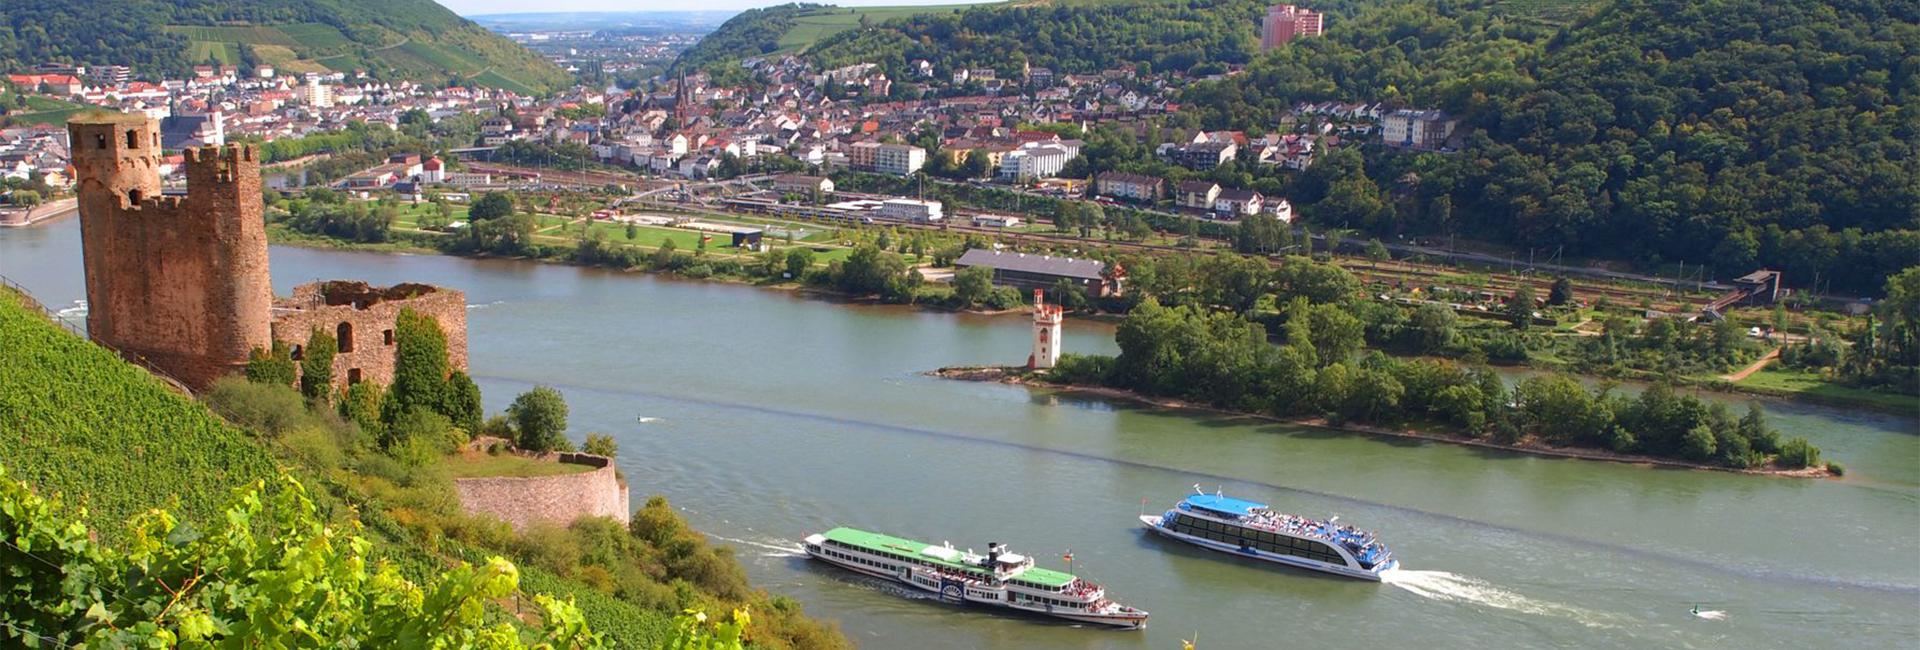 2019: 6-dages all incl. tur til Rüdesheim m. Rhinen i Flammer show